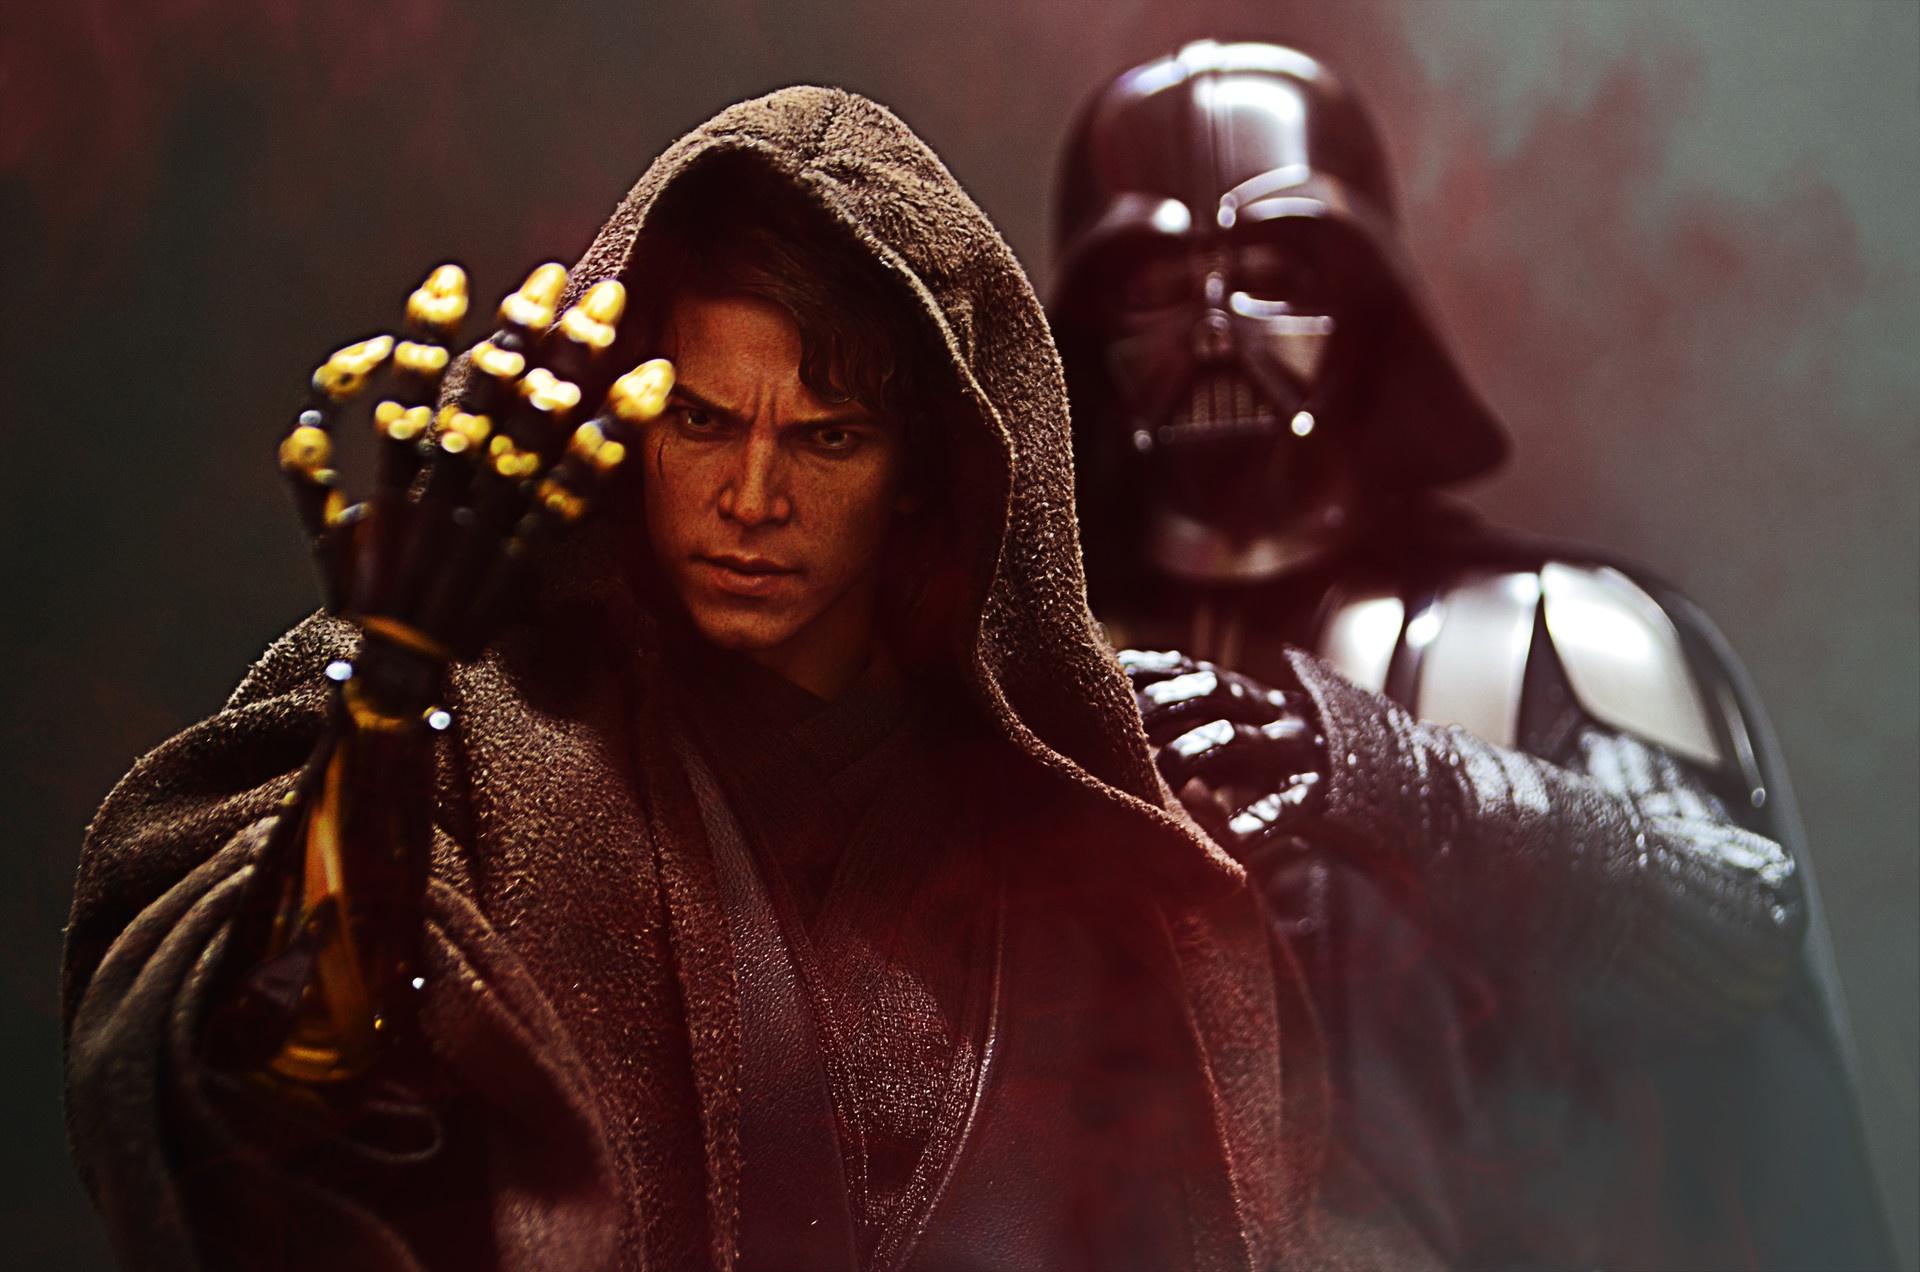 Wallpaper Darth Vader Anakin Skywalker Star Wars Science